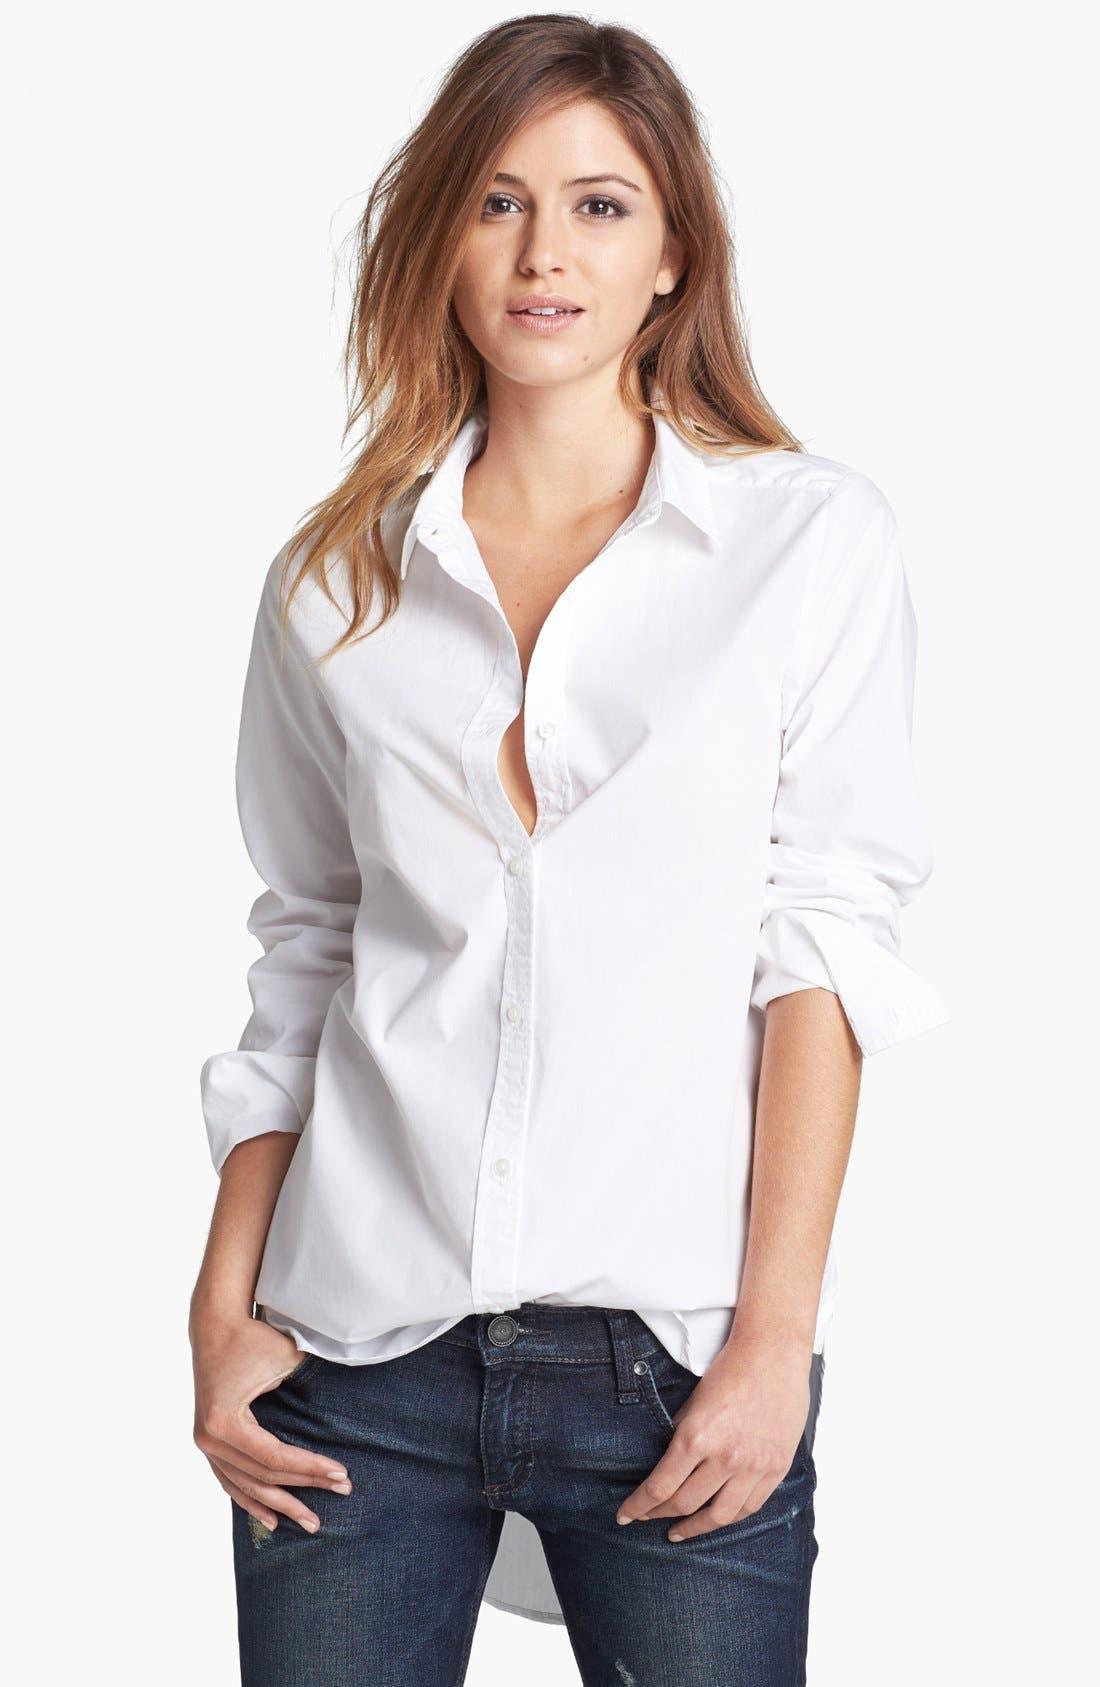 Main Image - Tildon 'Clean' Oversized Button-Up Shirt